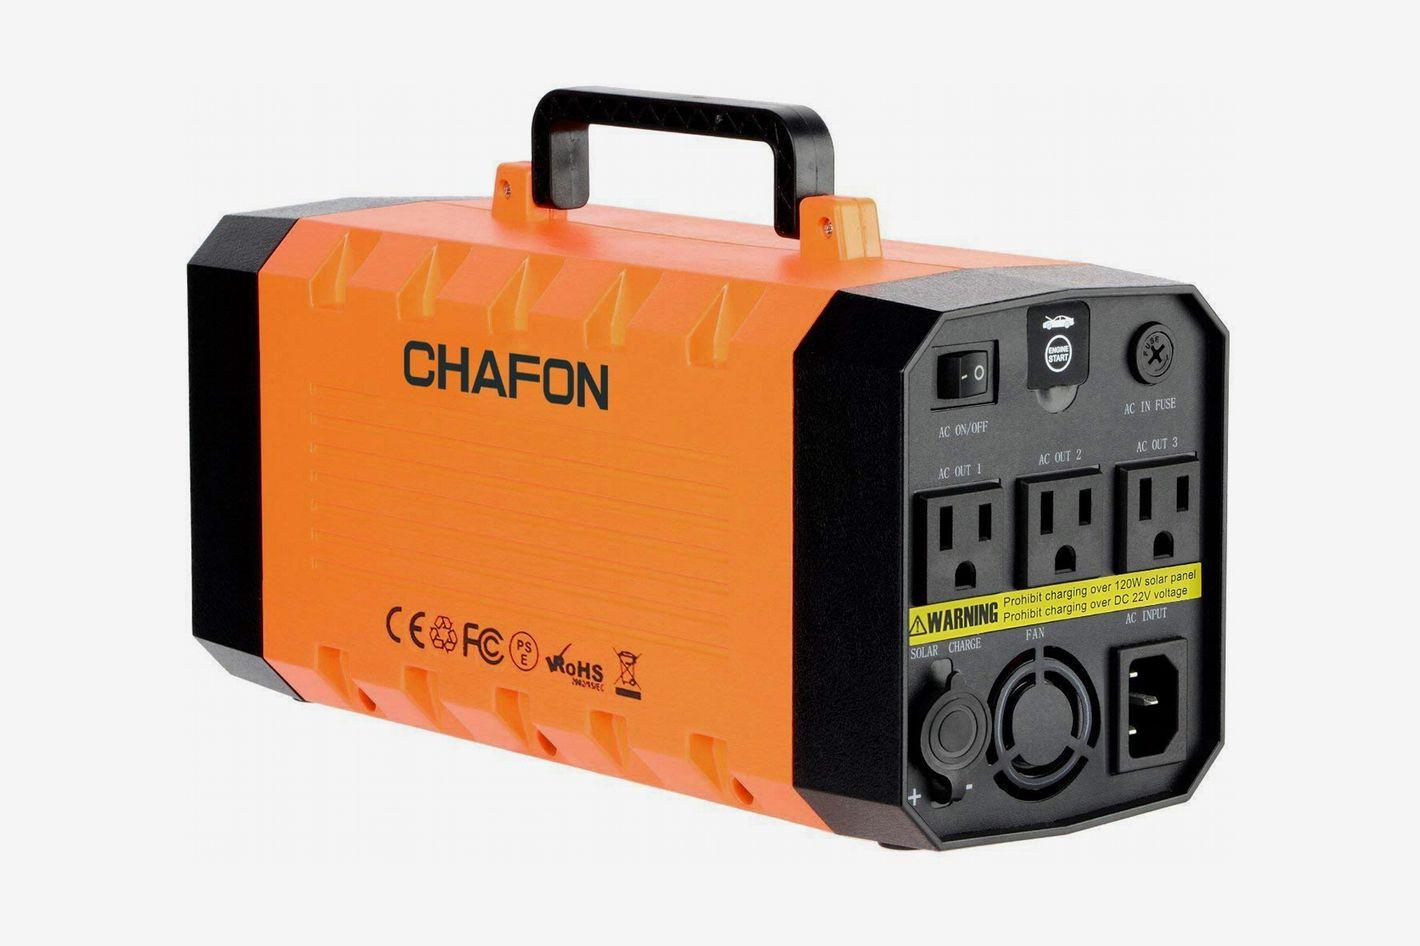 346wh portable ups battery backup generator at amazon